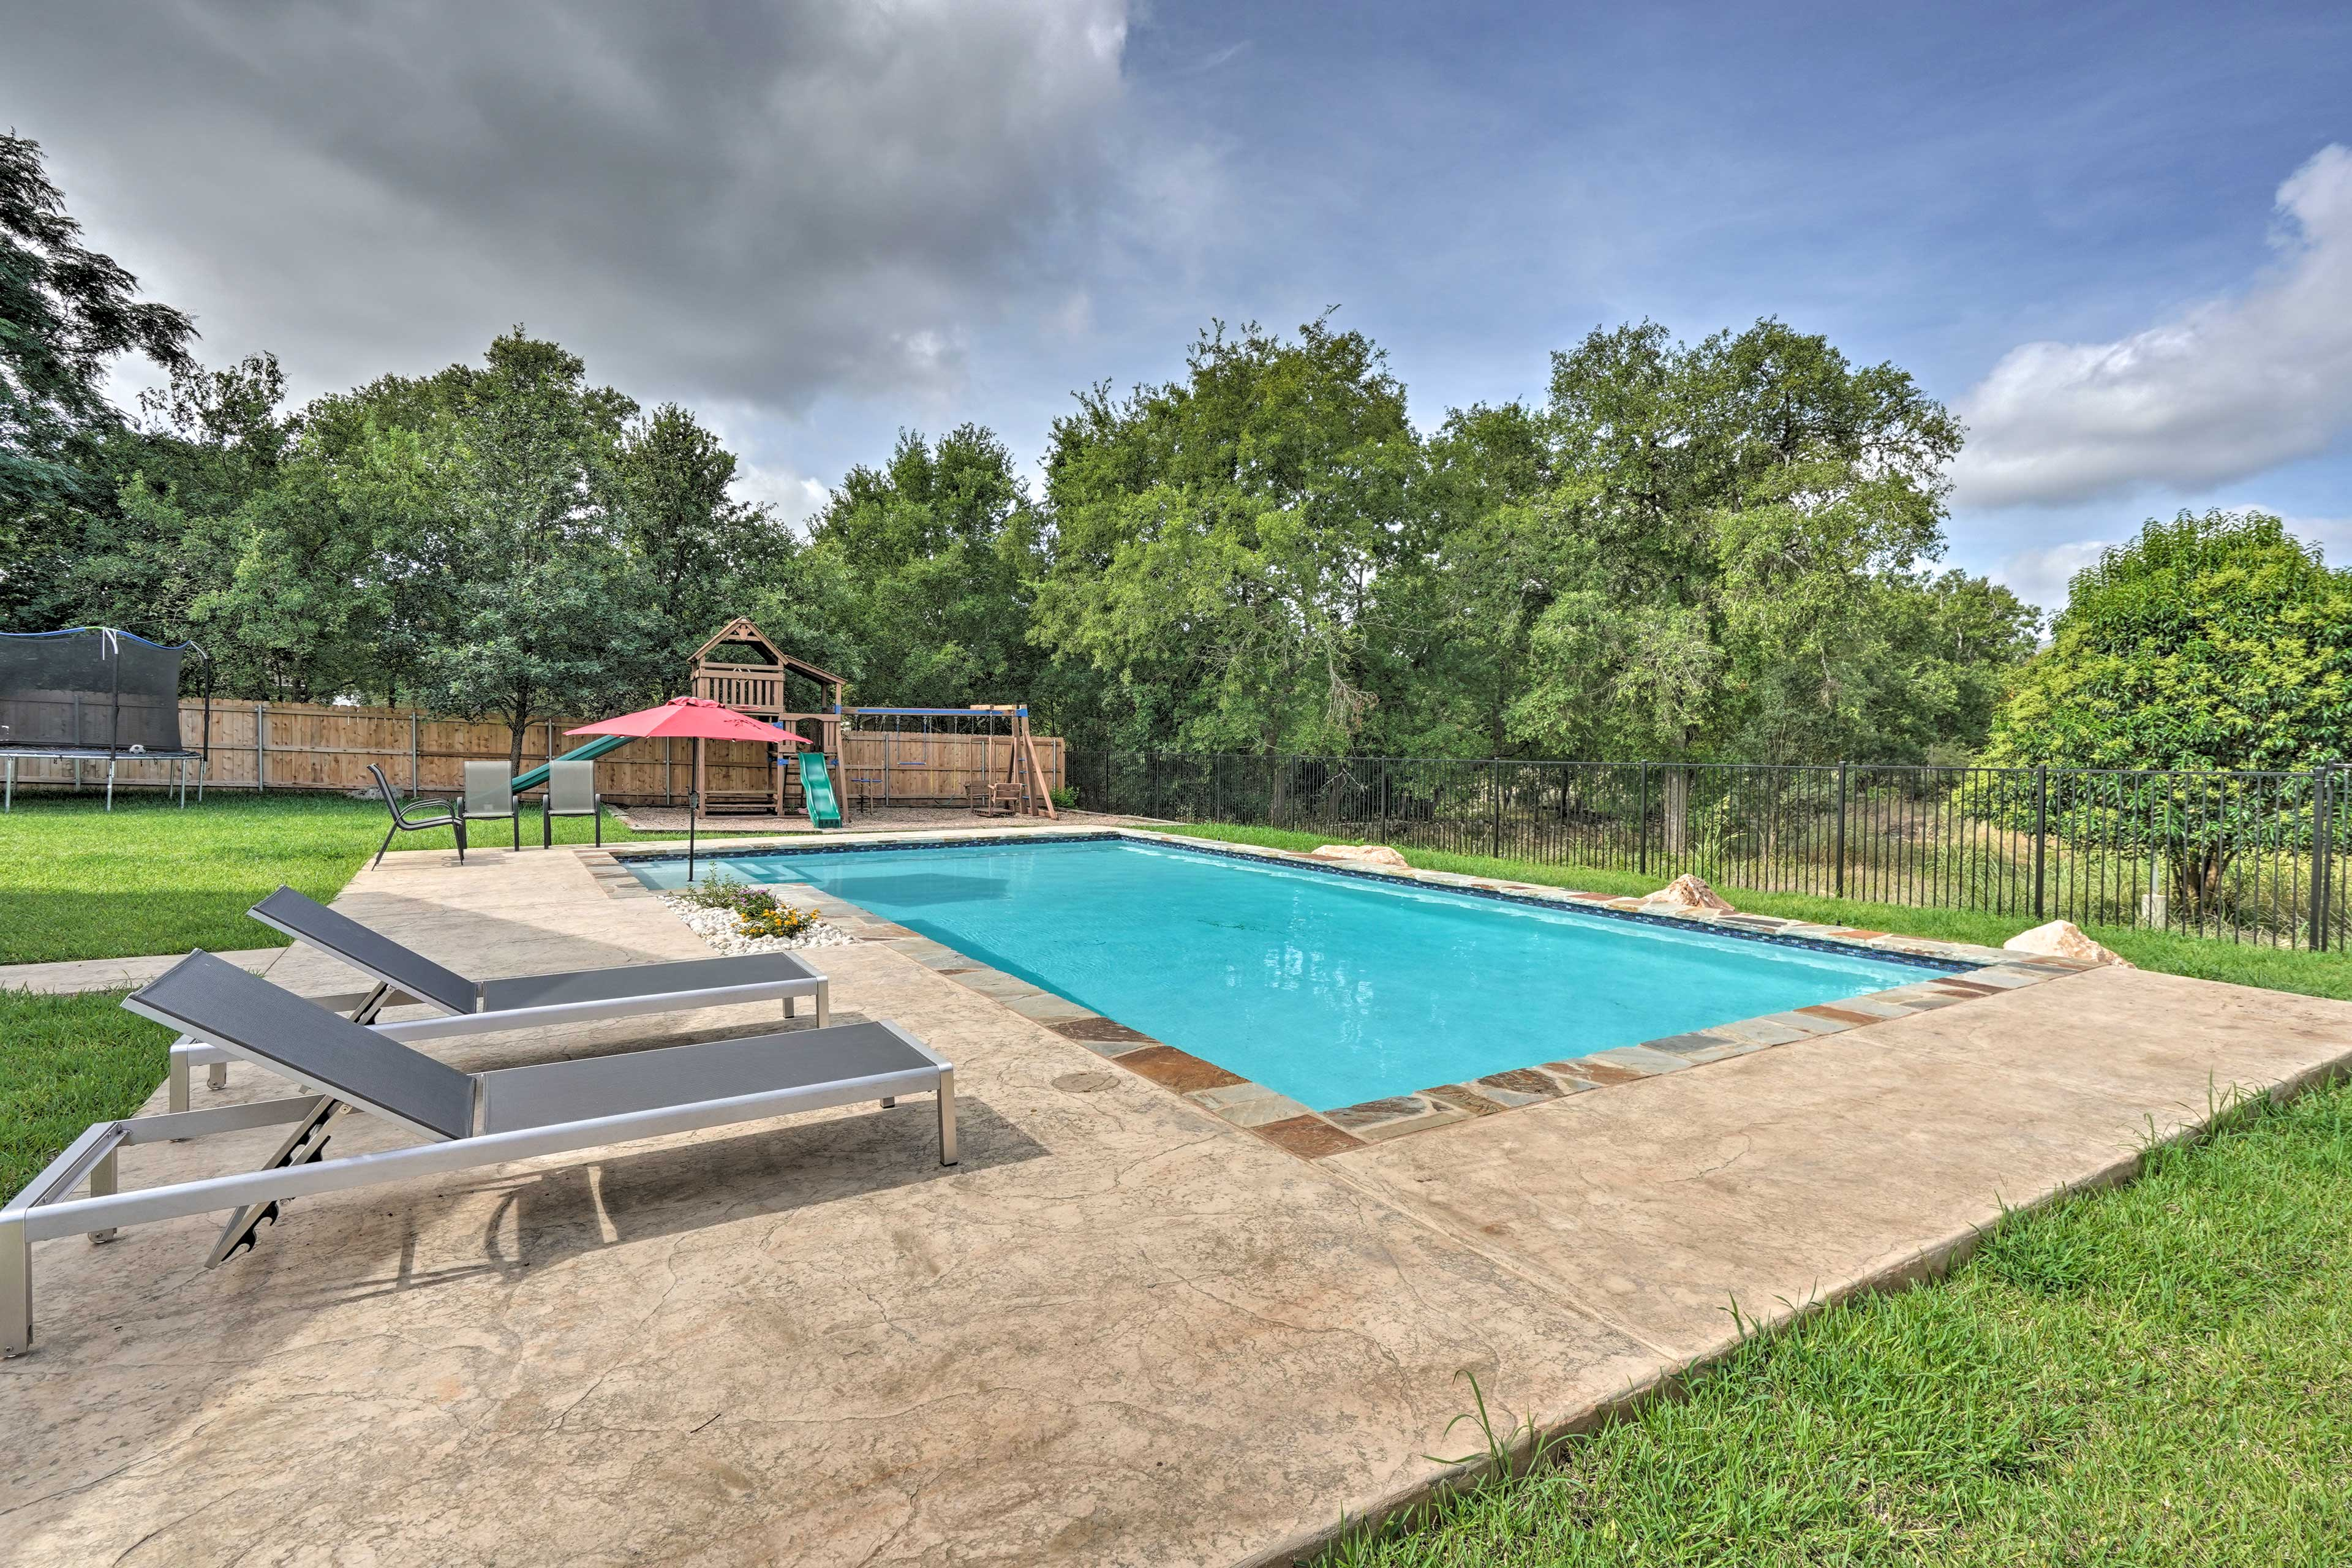 Shared Amenities | Pool | Playground | Trampoline